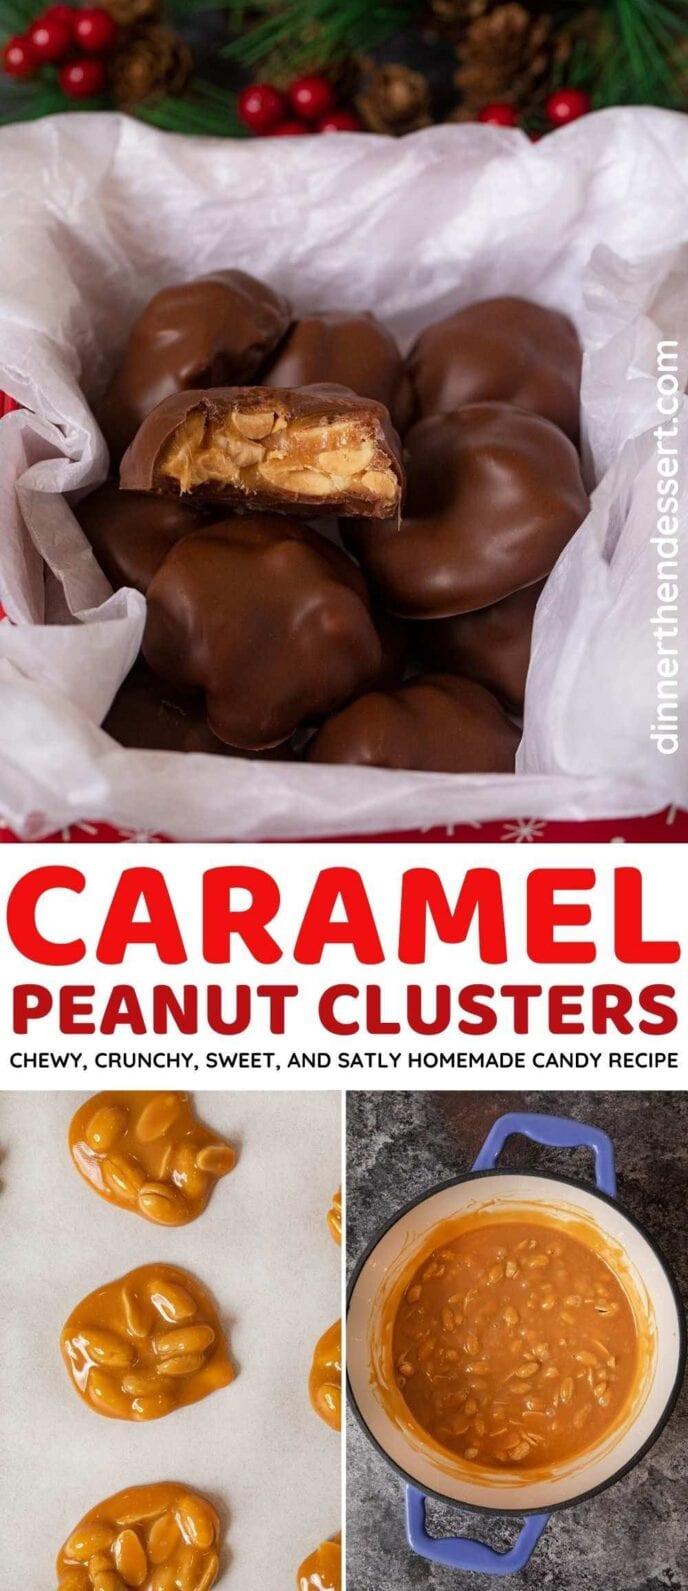 Caramel Peanut Clusters collage